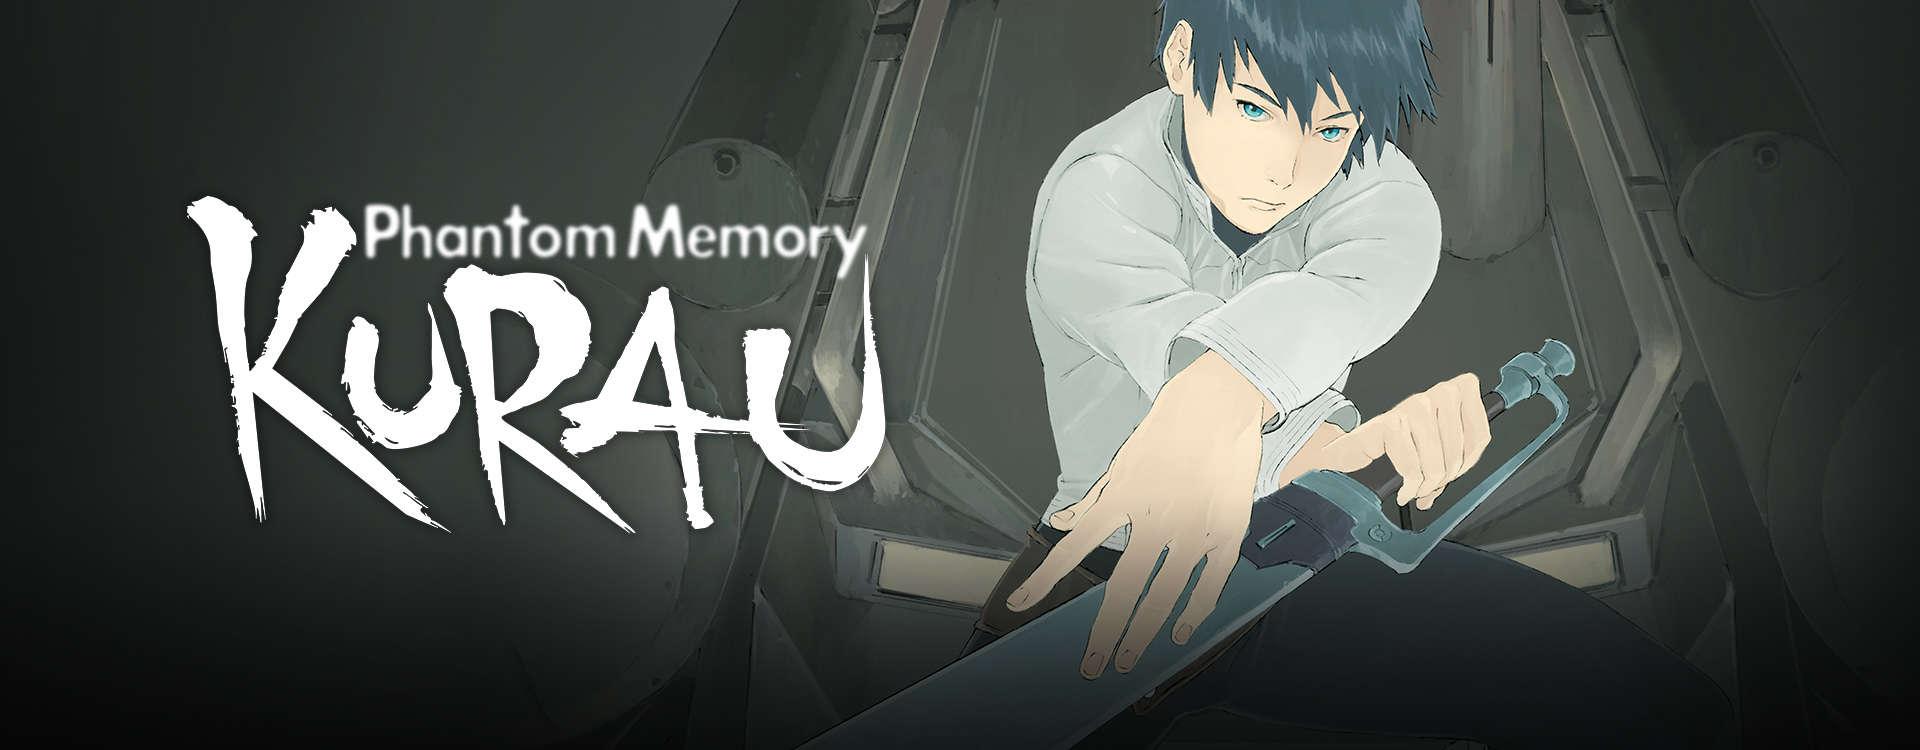 Kurau Phantom Memory